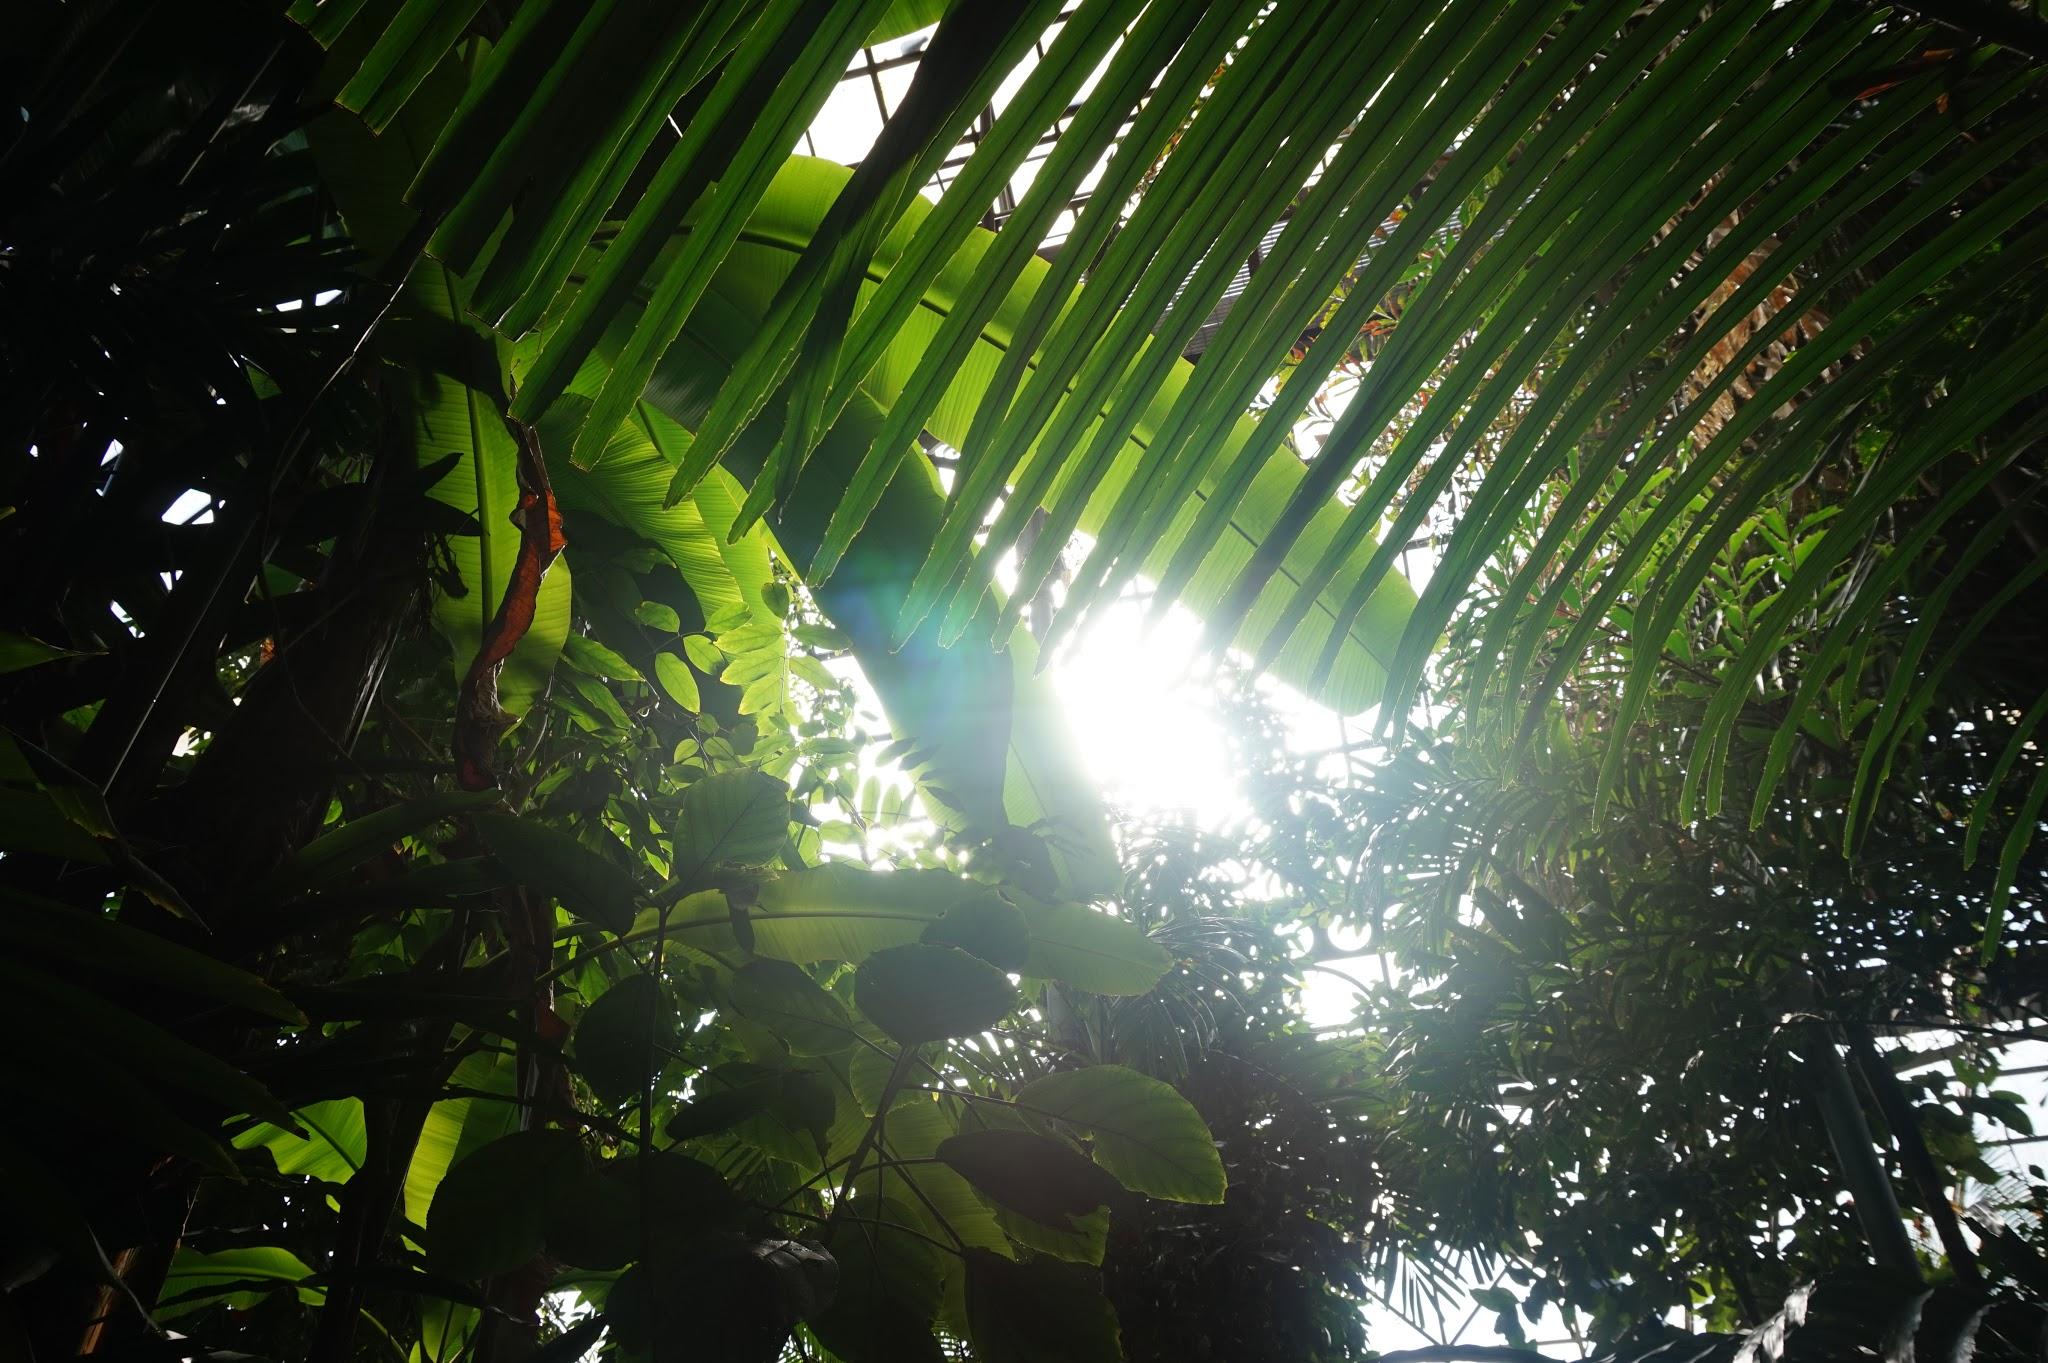 sunlight streaming through huge tall plants